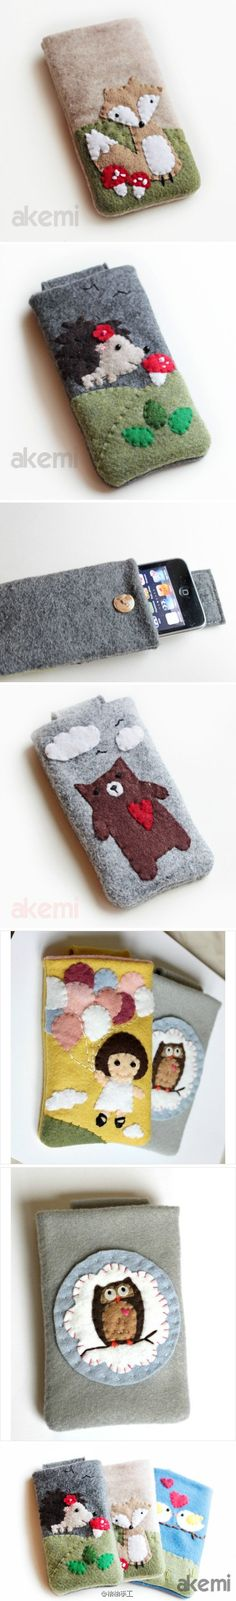 appliques diy case iphone, idea, craft, fox patch, felt mobile diy, iphon set, phone cases, felt sewing projects, felt patch